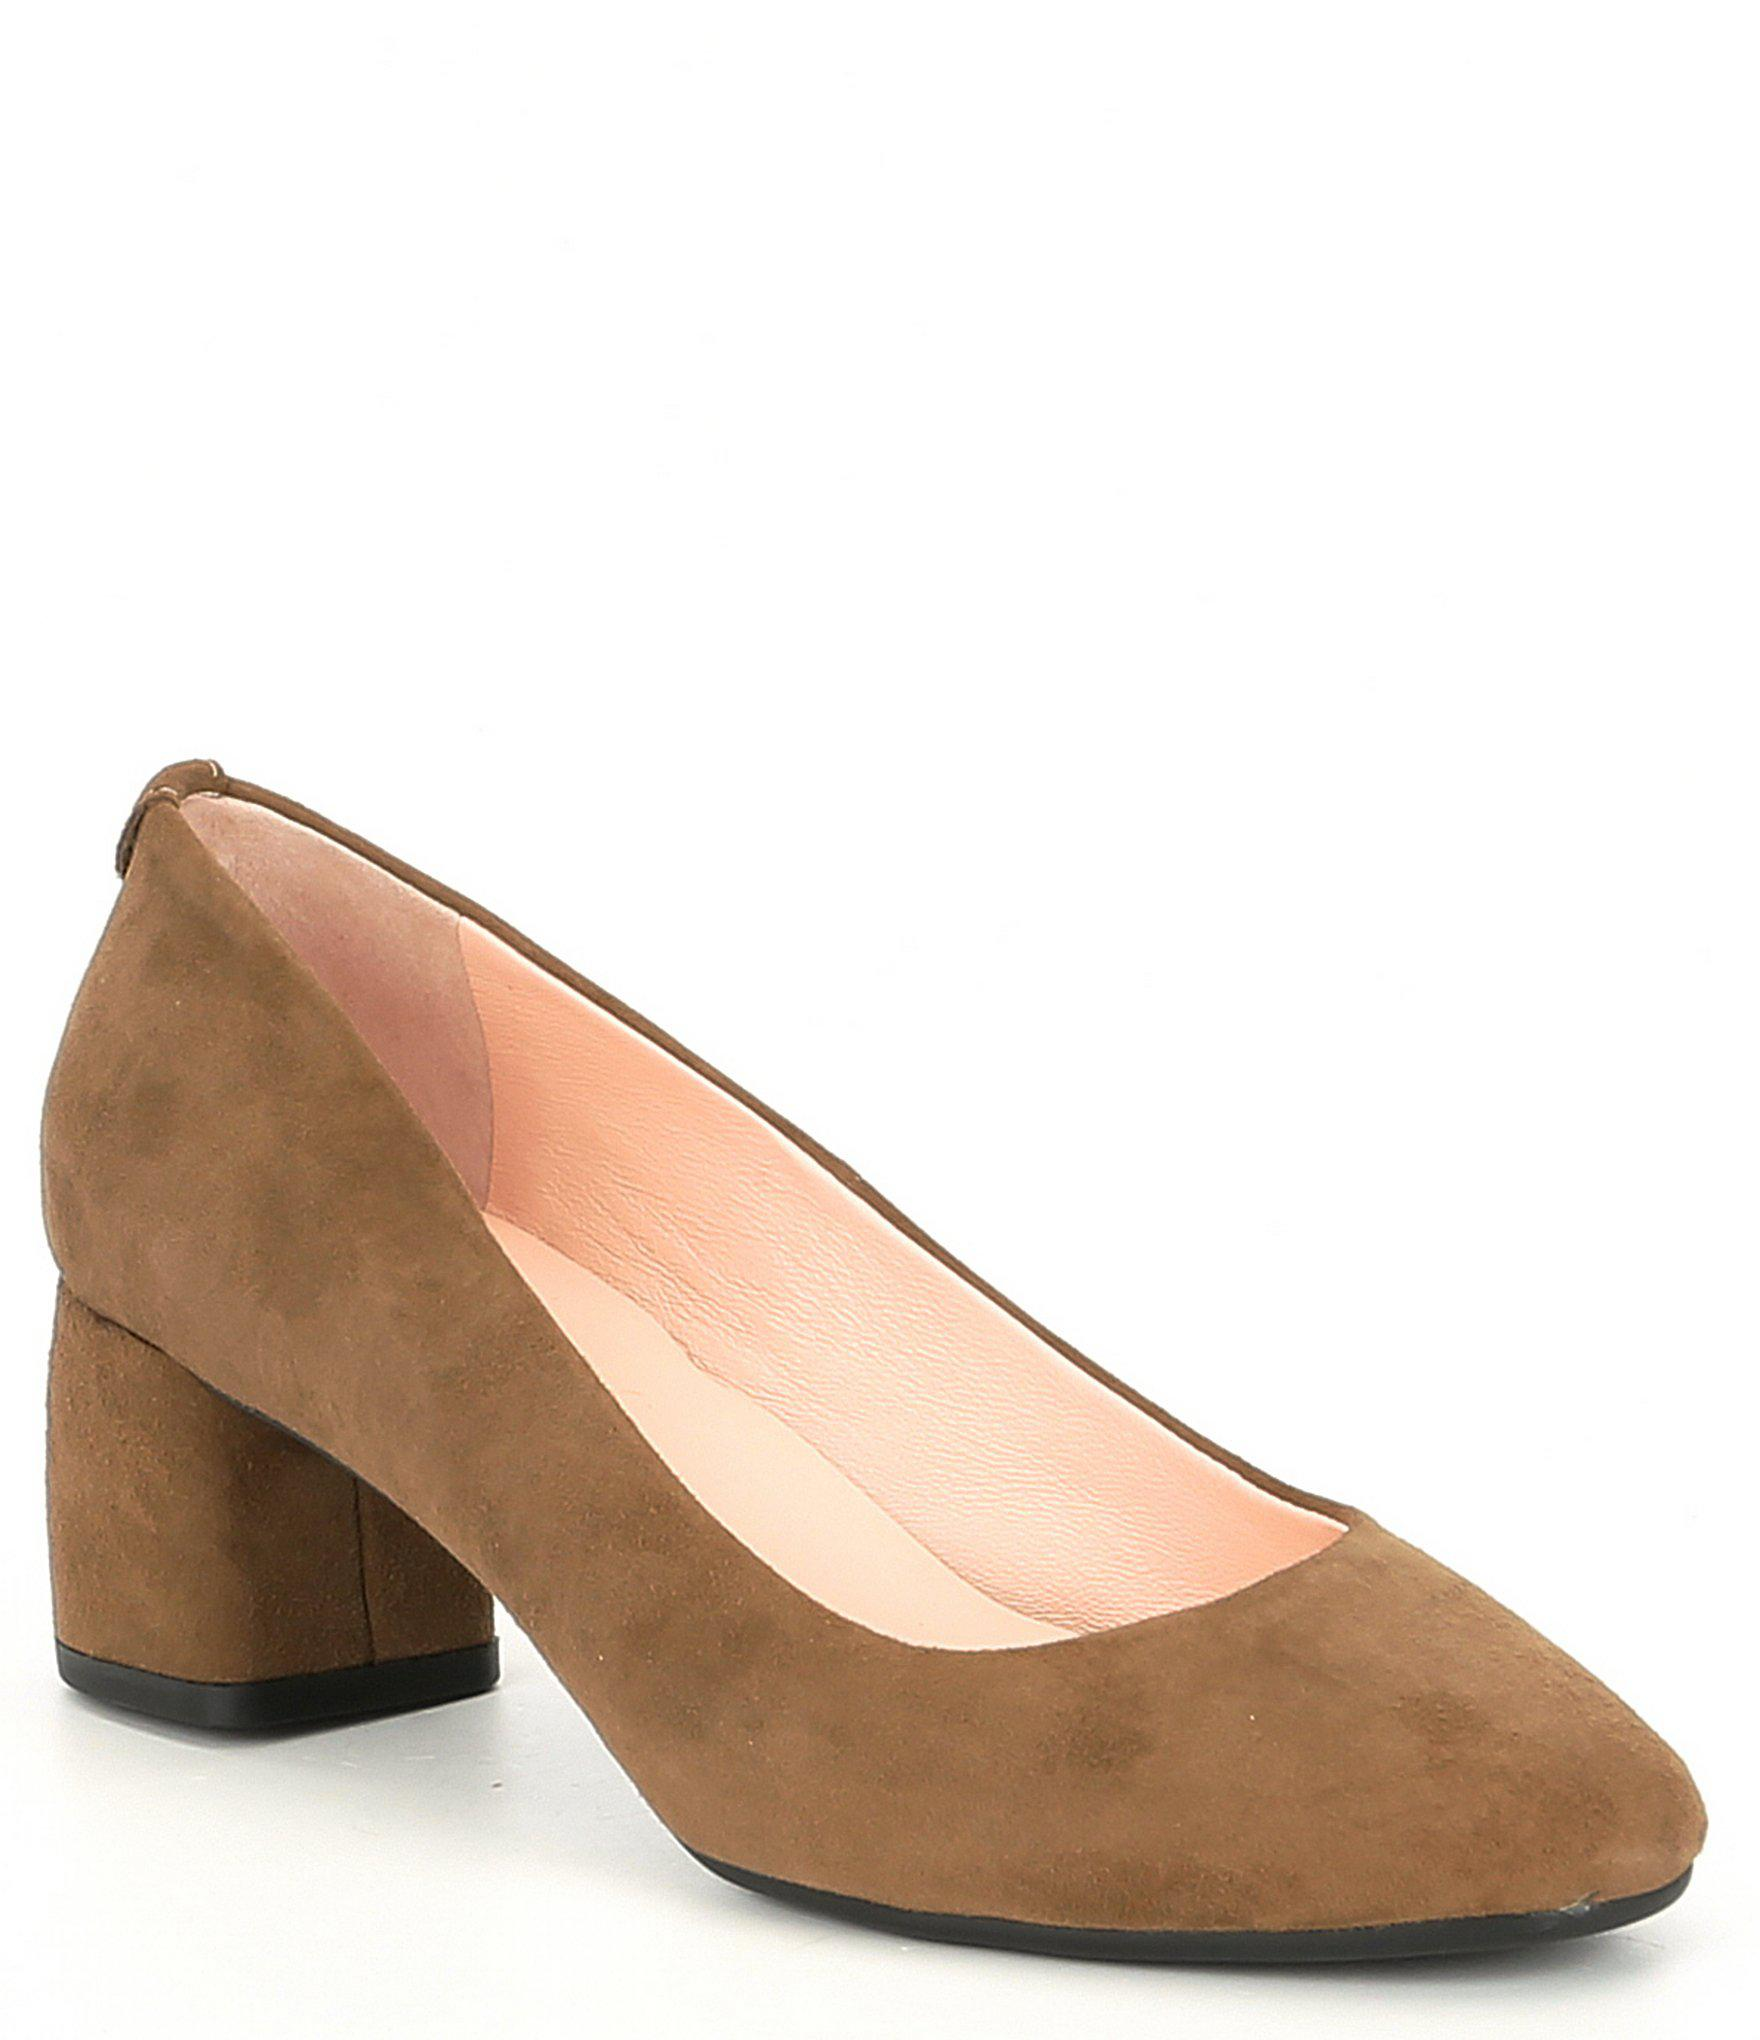 e9a30f443fba Lyst - Kate Spade Beverly Suede Block Heel Pumps in Brown